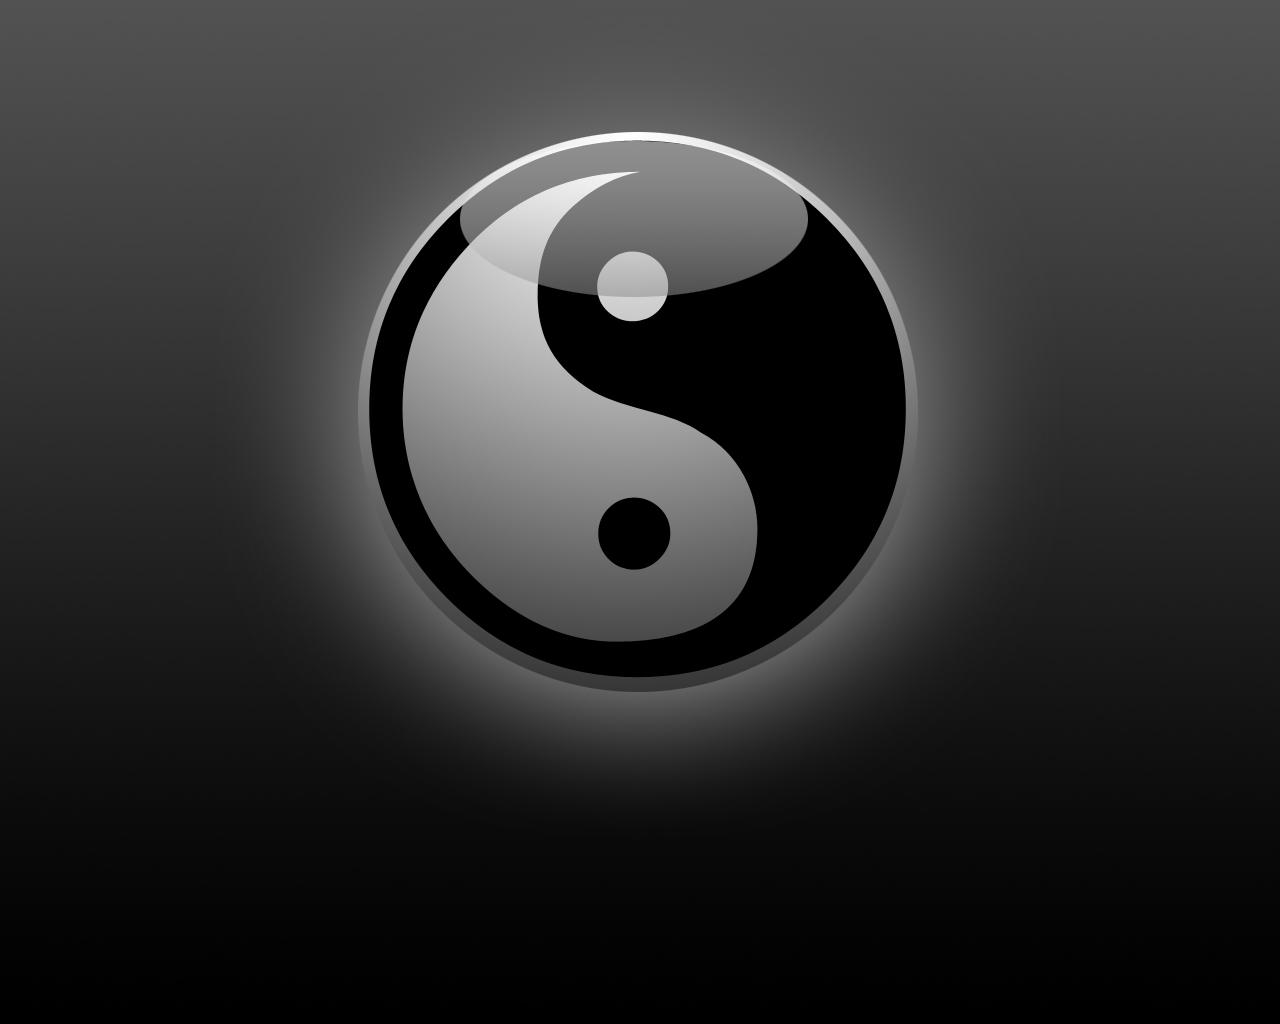 Yin Yang HD Wallpaper - WallpaperSafari